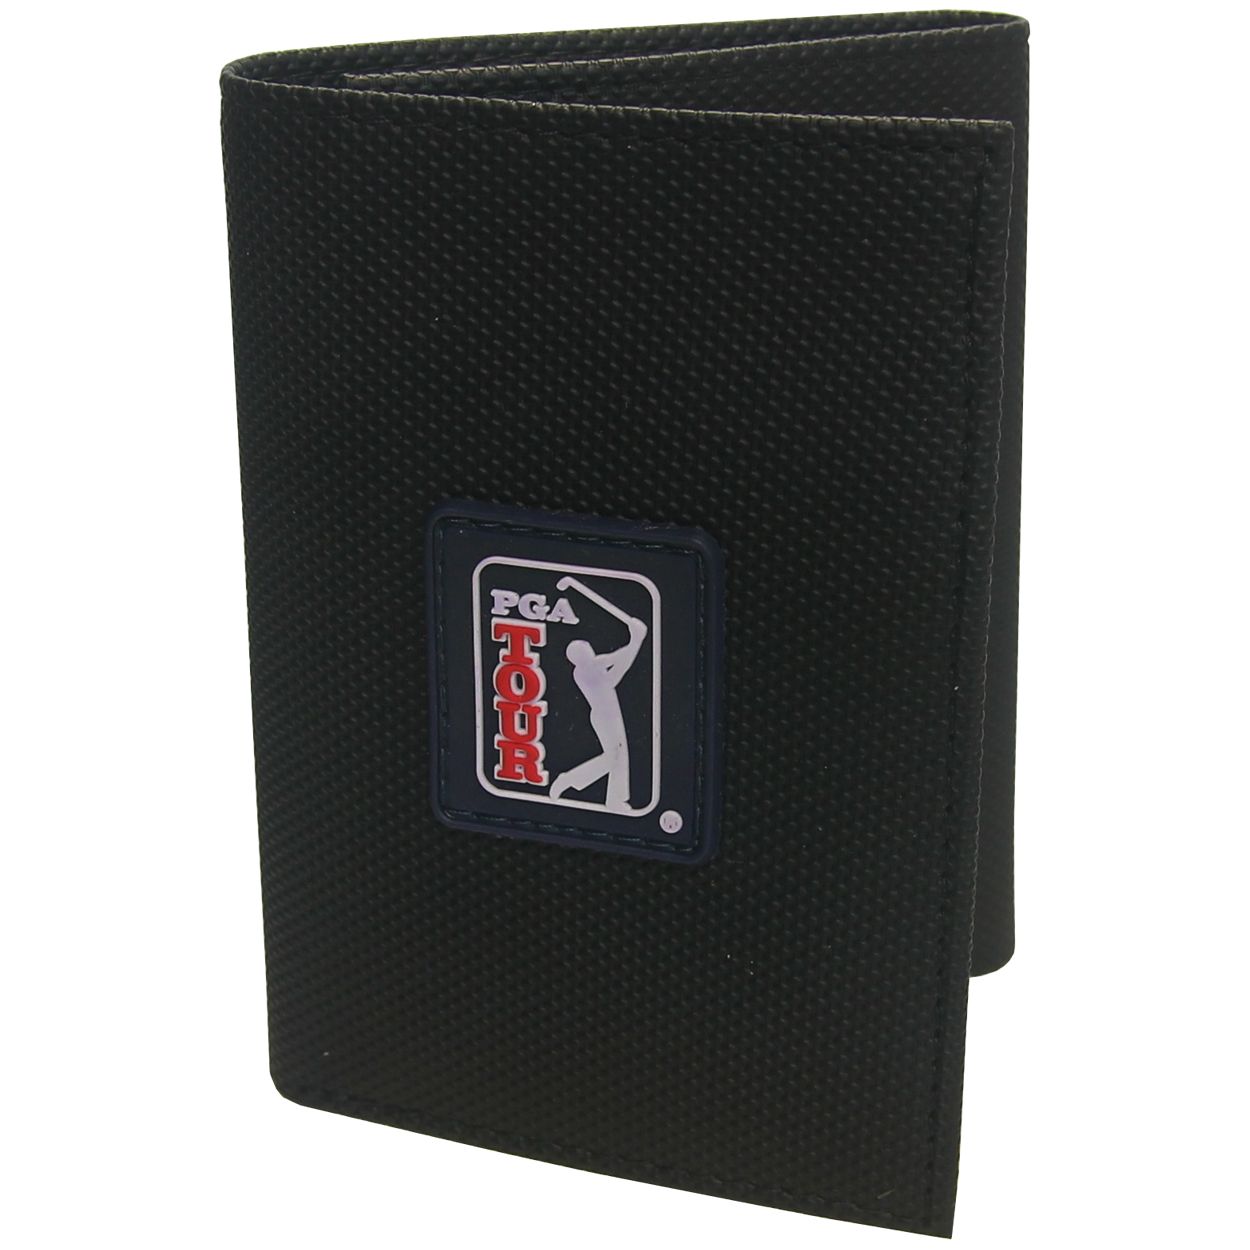 PGA Tour Golf Tri-Fold...